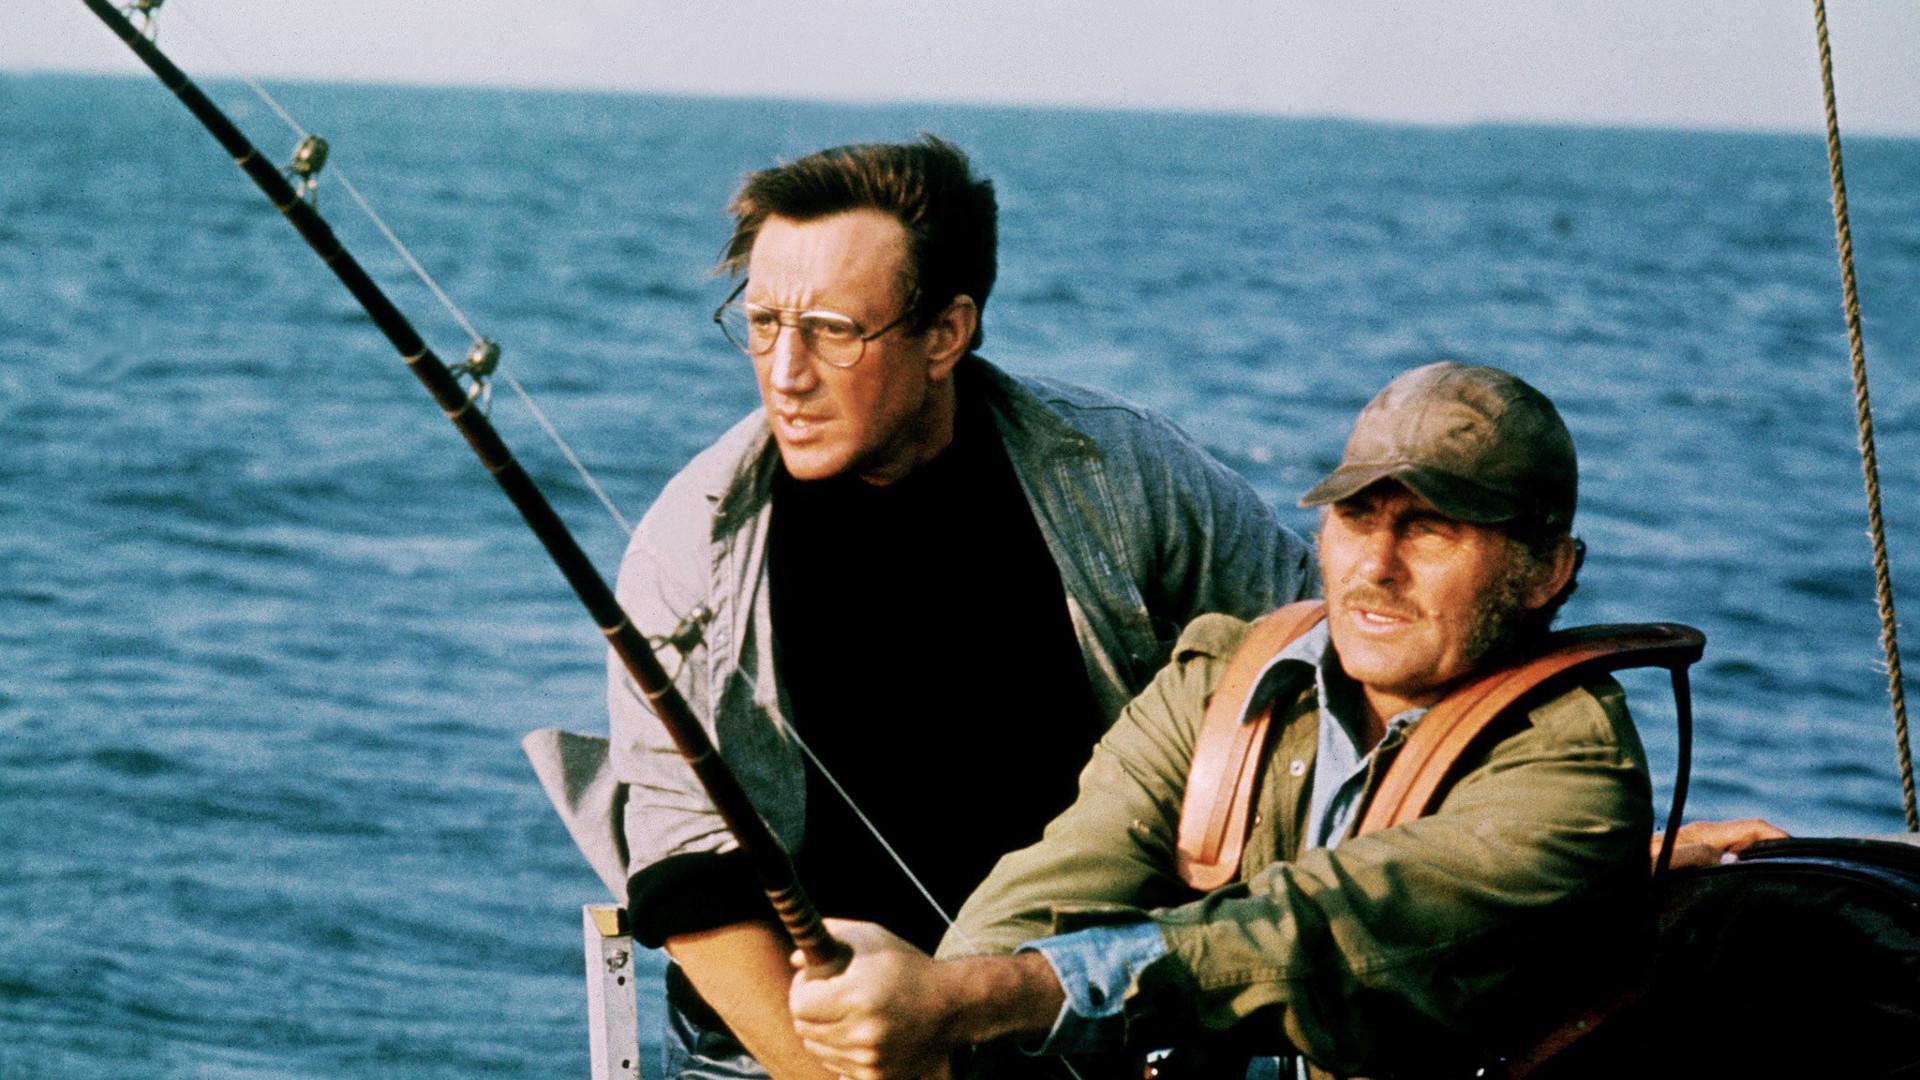 Jaws - Cápa (1975) 2. kép